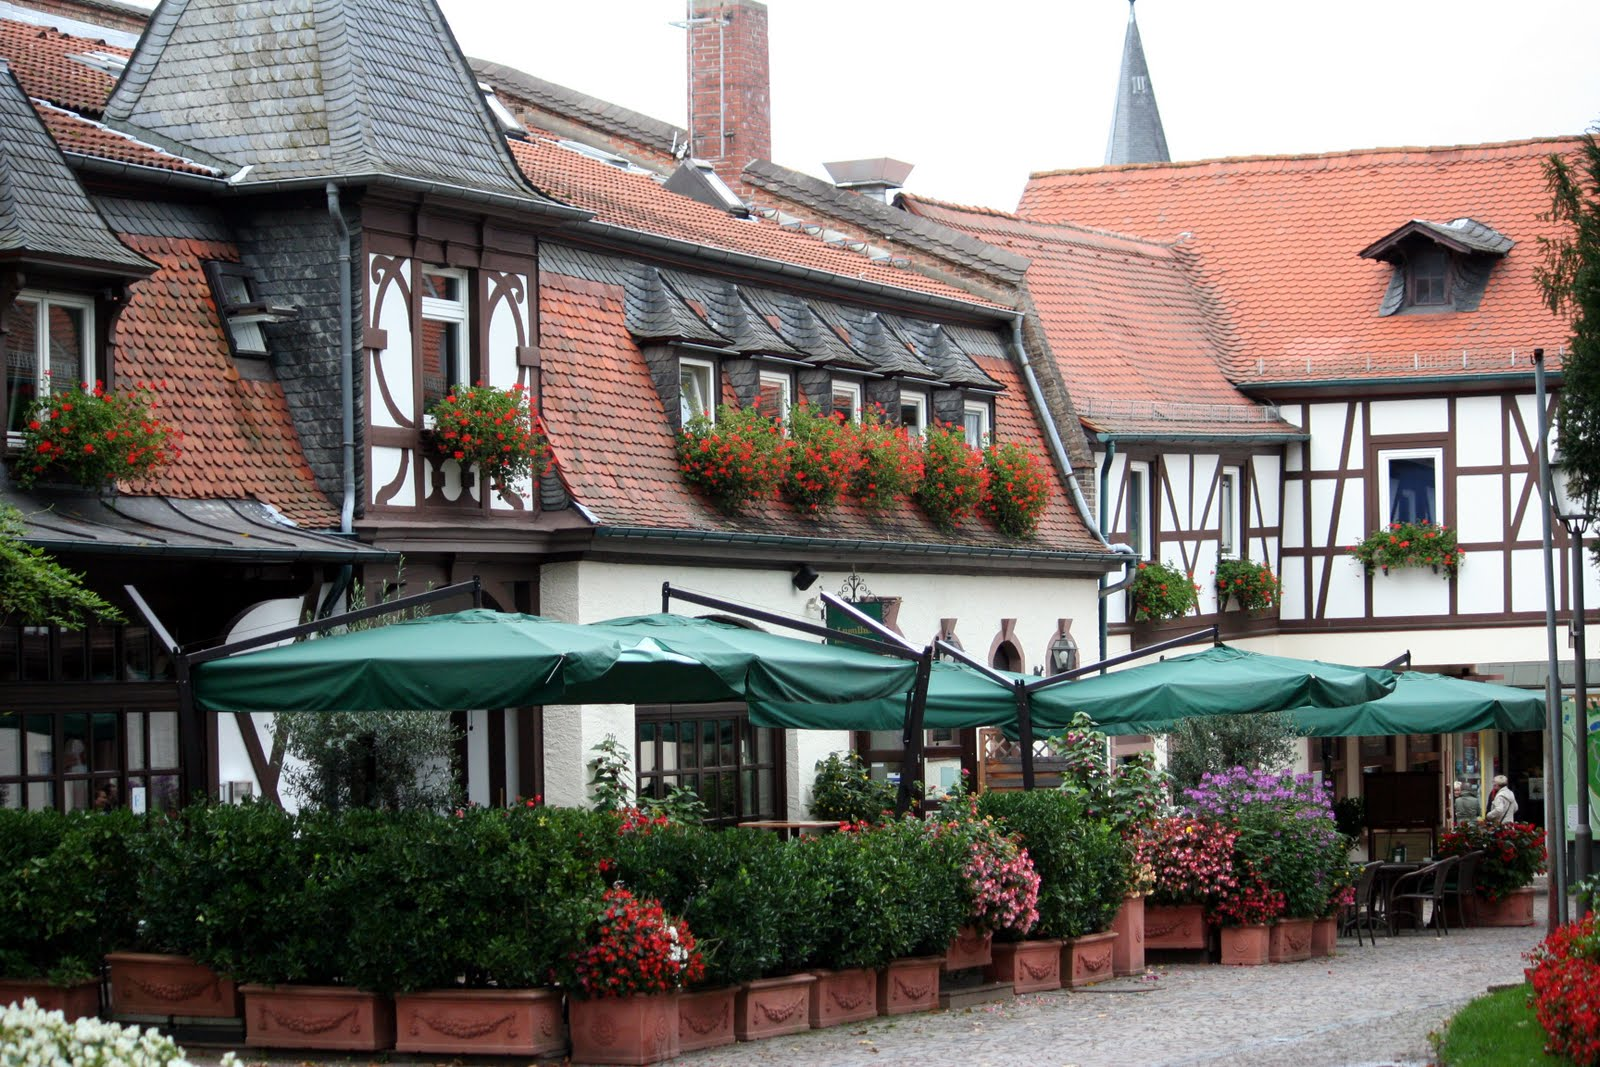 http://www.travelsys.sk/public/users/paxtour/images/fotogaleria_hotel/l_krasy_saska05.jpg